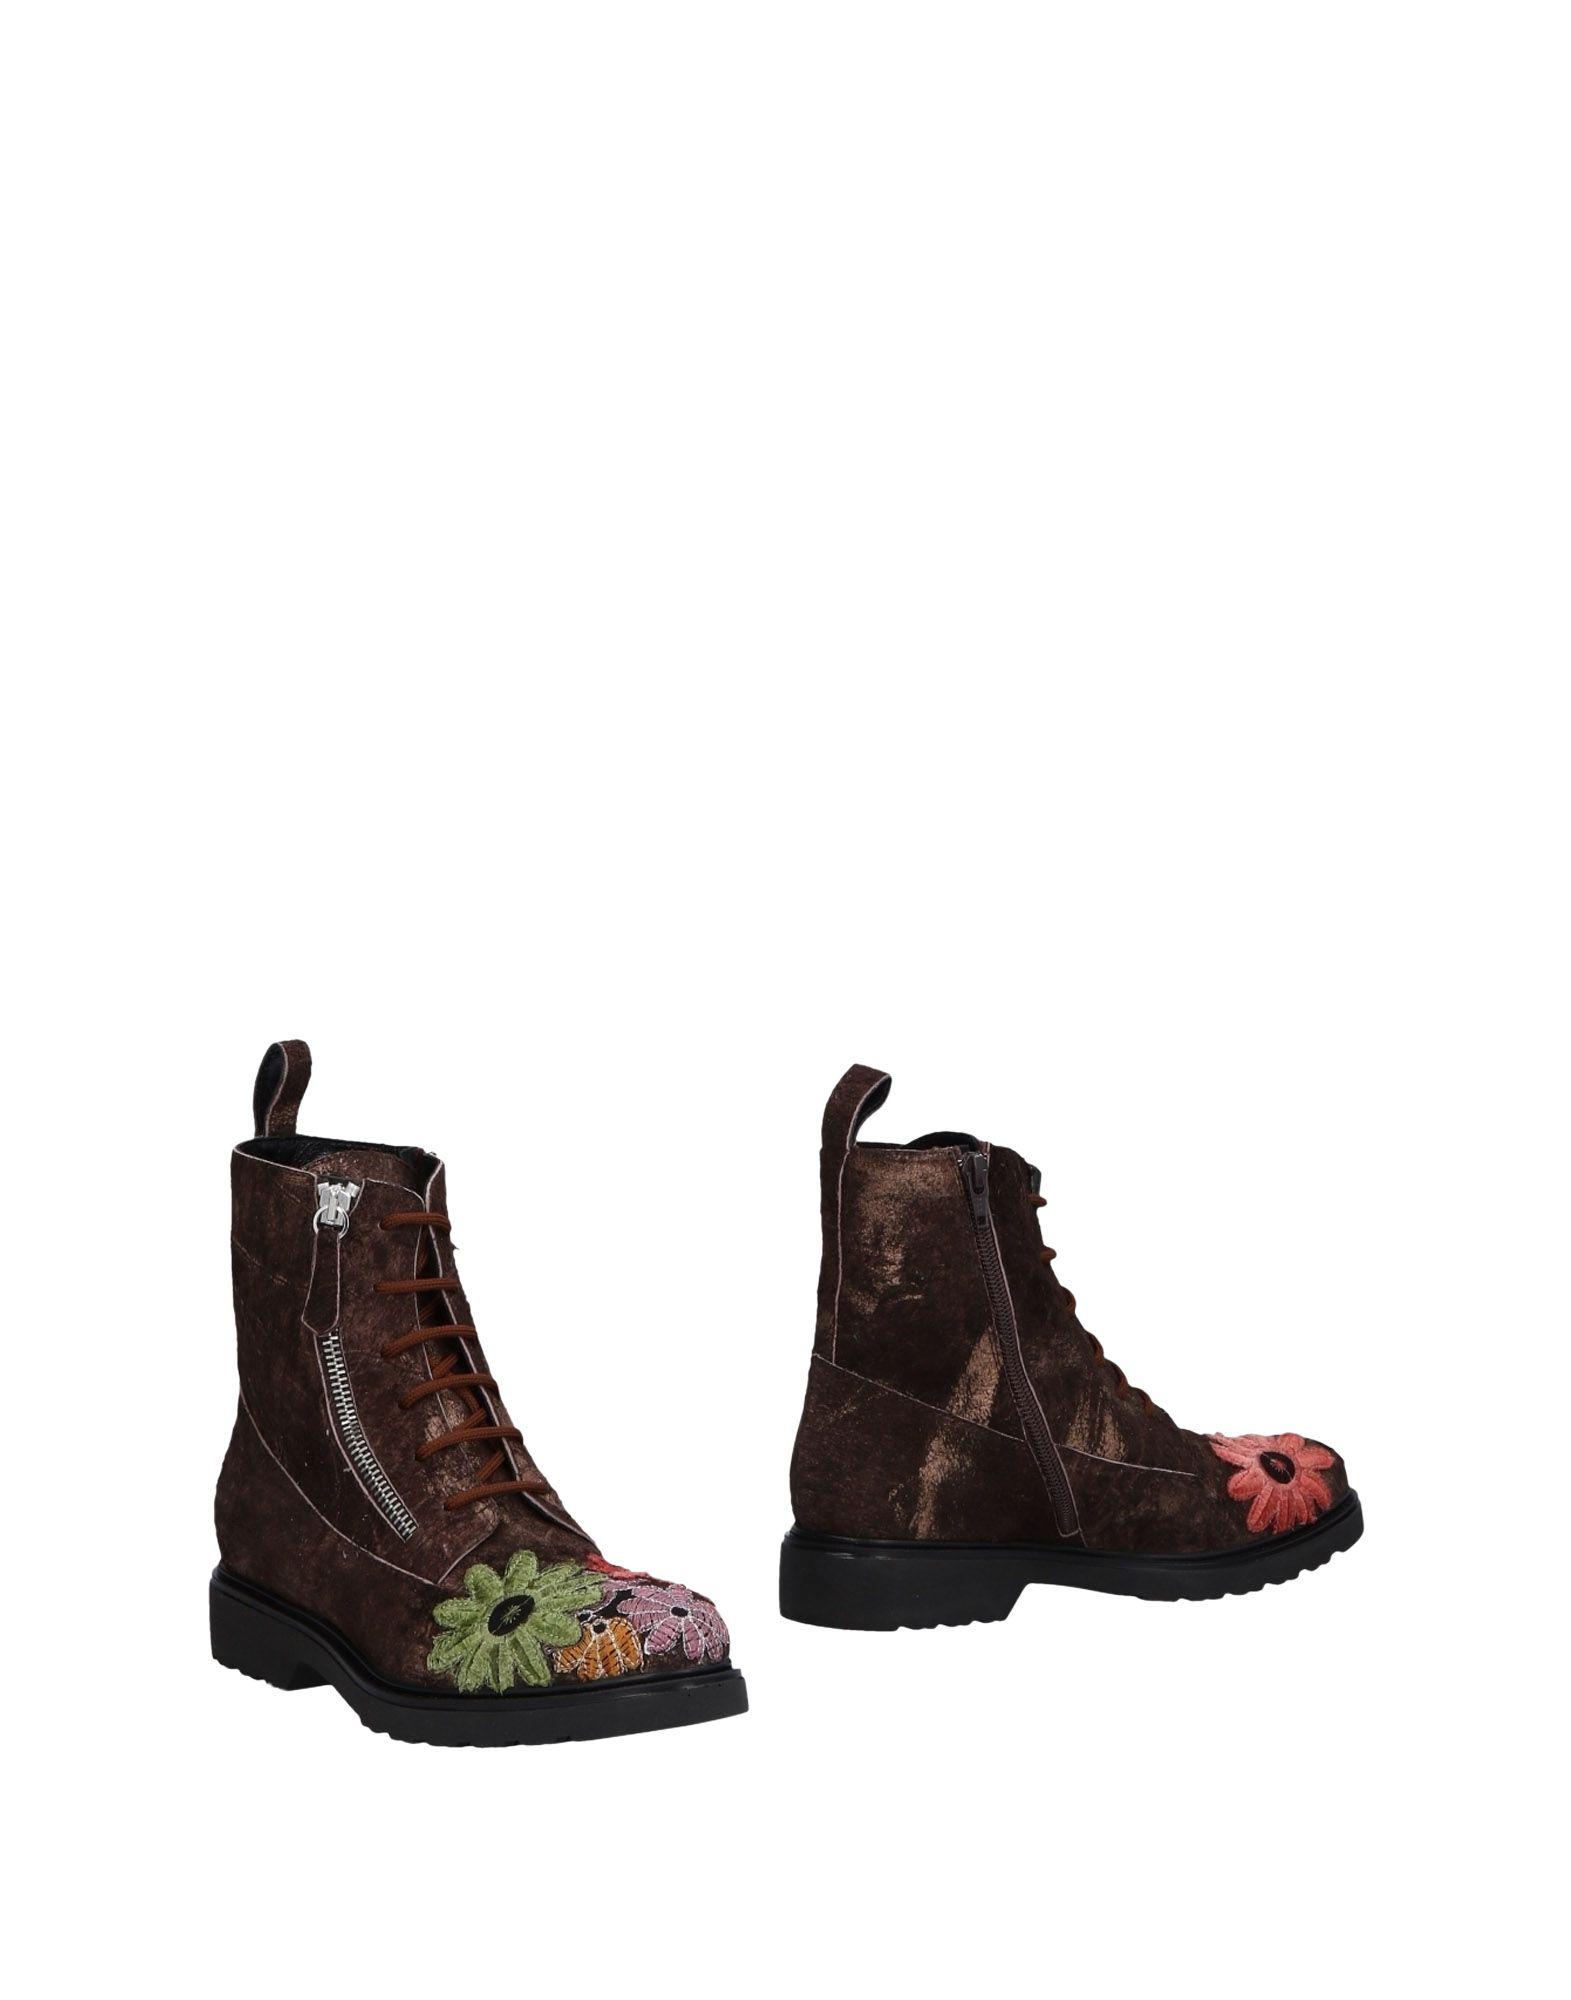 Giancarlo Paoli Stiefelette Damen  11477317RUGut aussehende strapazierfähige Schuhe